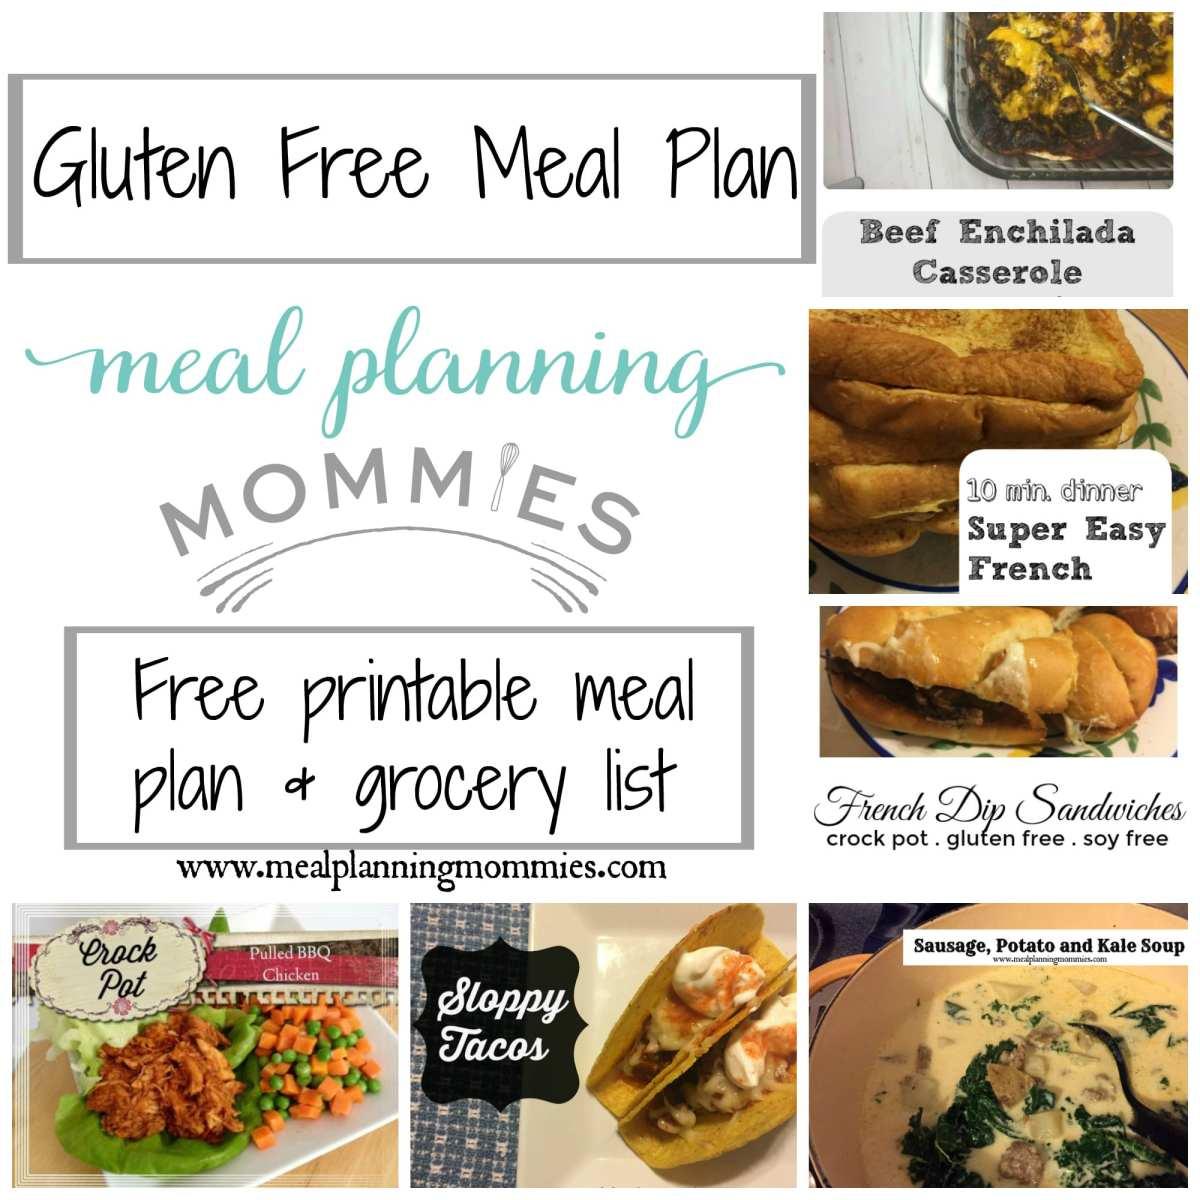 Gluten Free Meal Plan December 5-10th